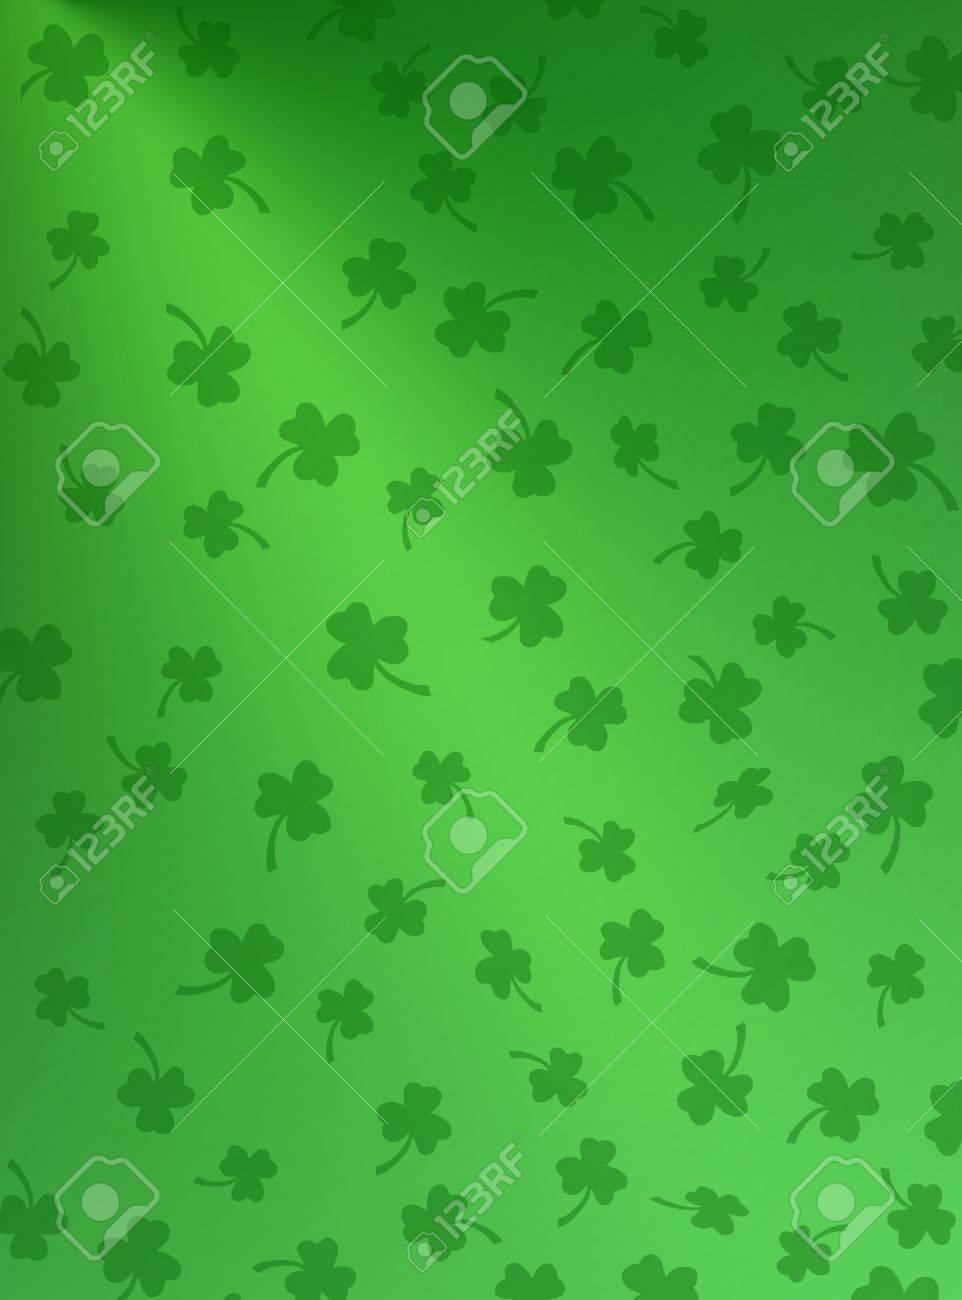 Shamrocks on gradient green background. Stock Photo - 2608300